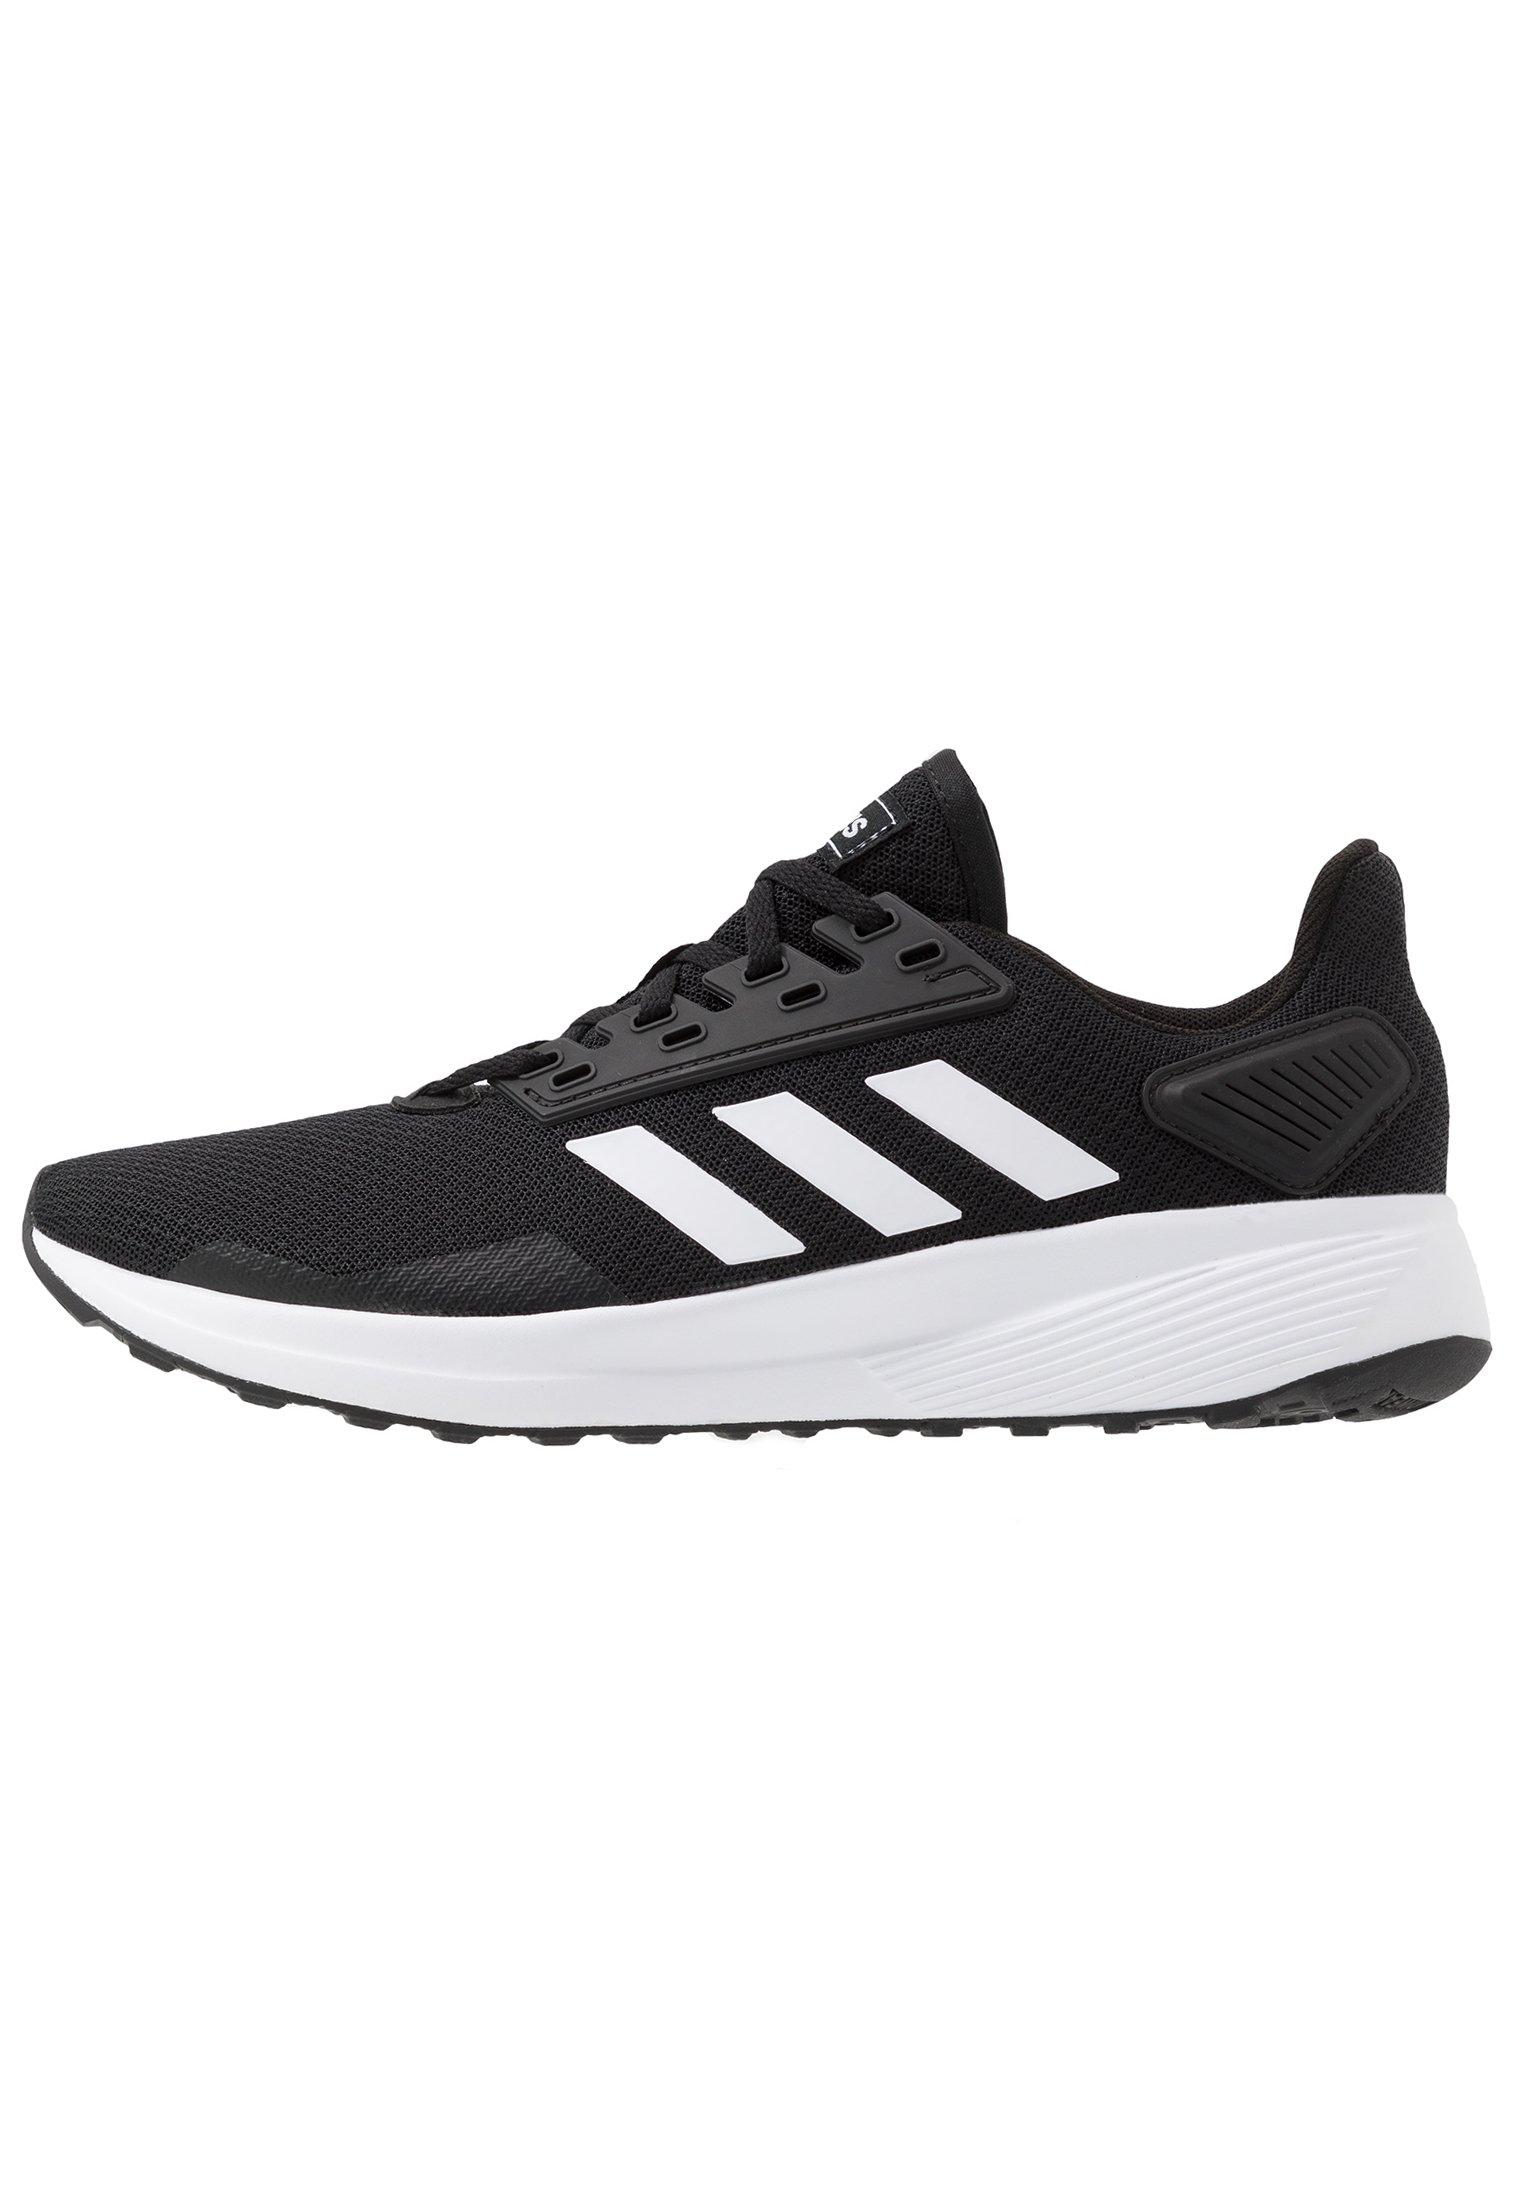 adidas Performance DURAMO 9 Chaussures de running neutres